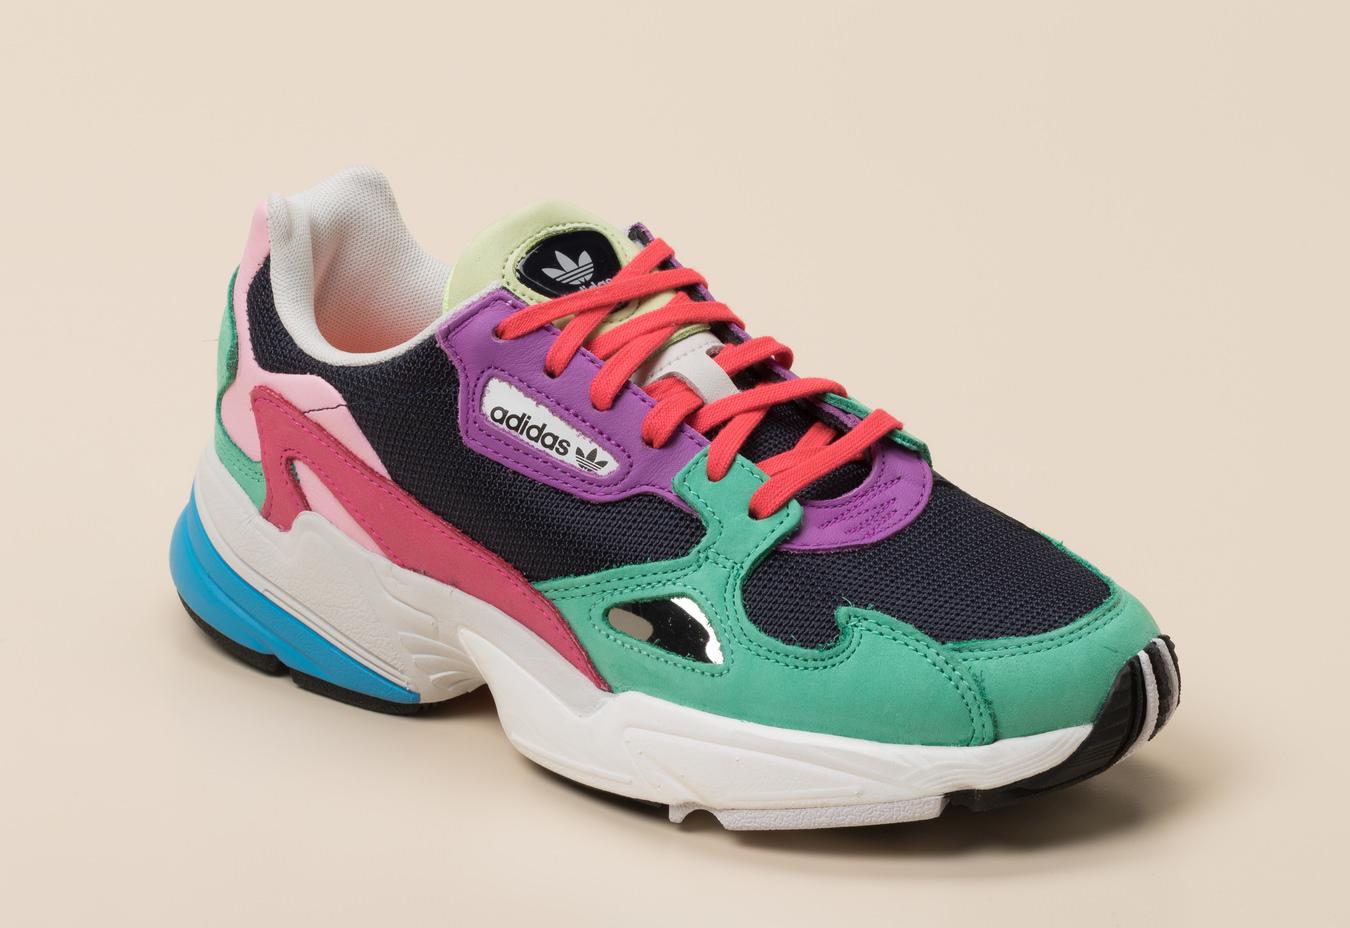 Adidas Damen Sneaker in multi/bunt kaufen | Zumnorde Online-Shop